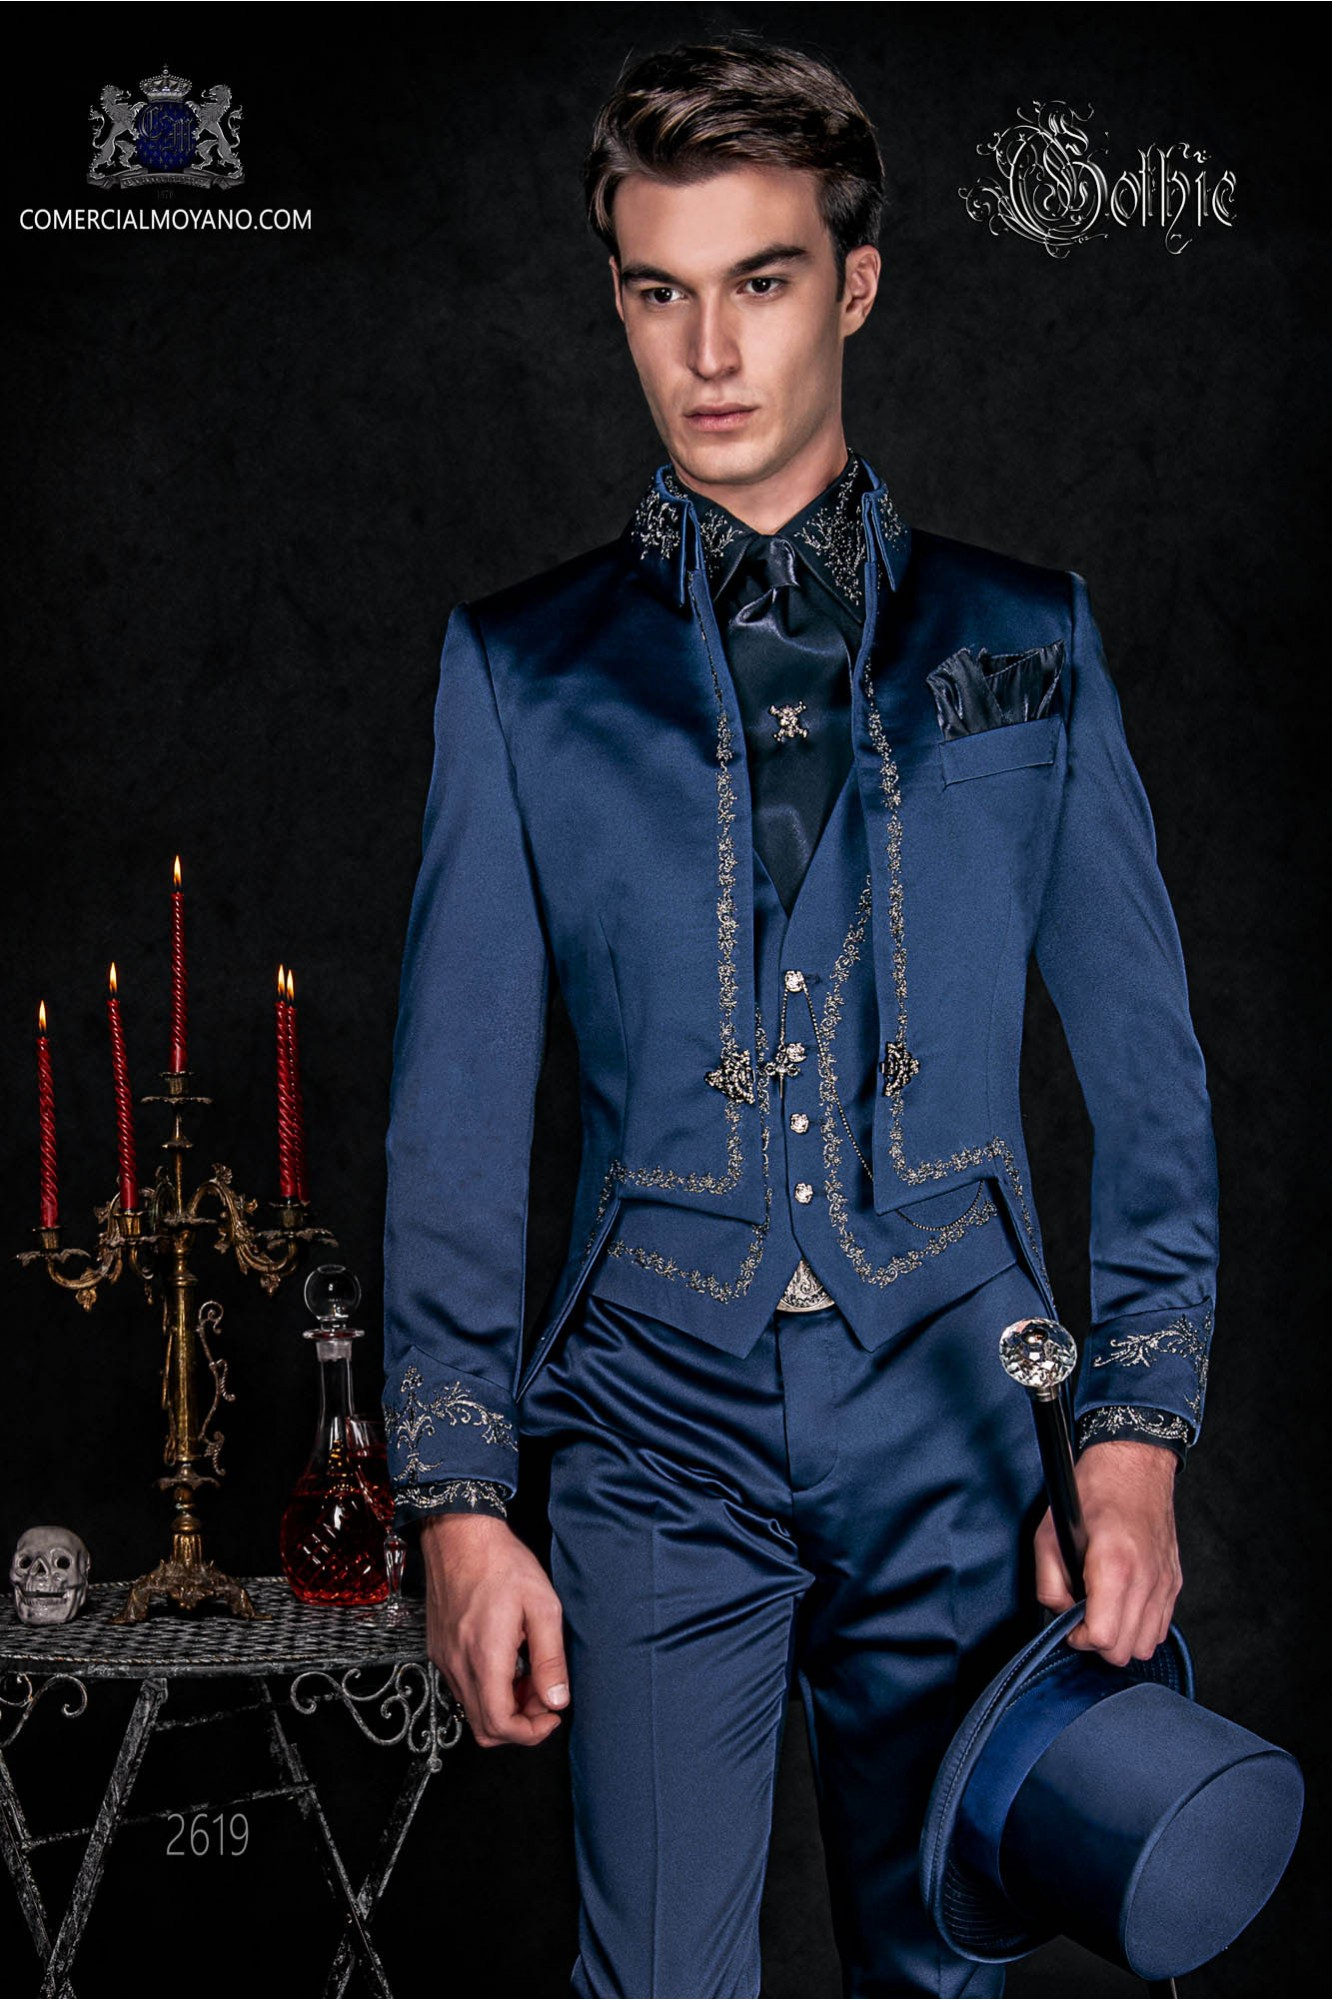 Frac gótico de raso azul con bordado plata